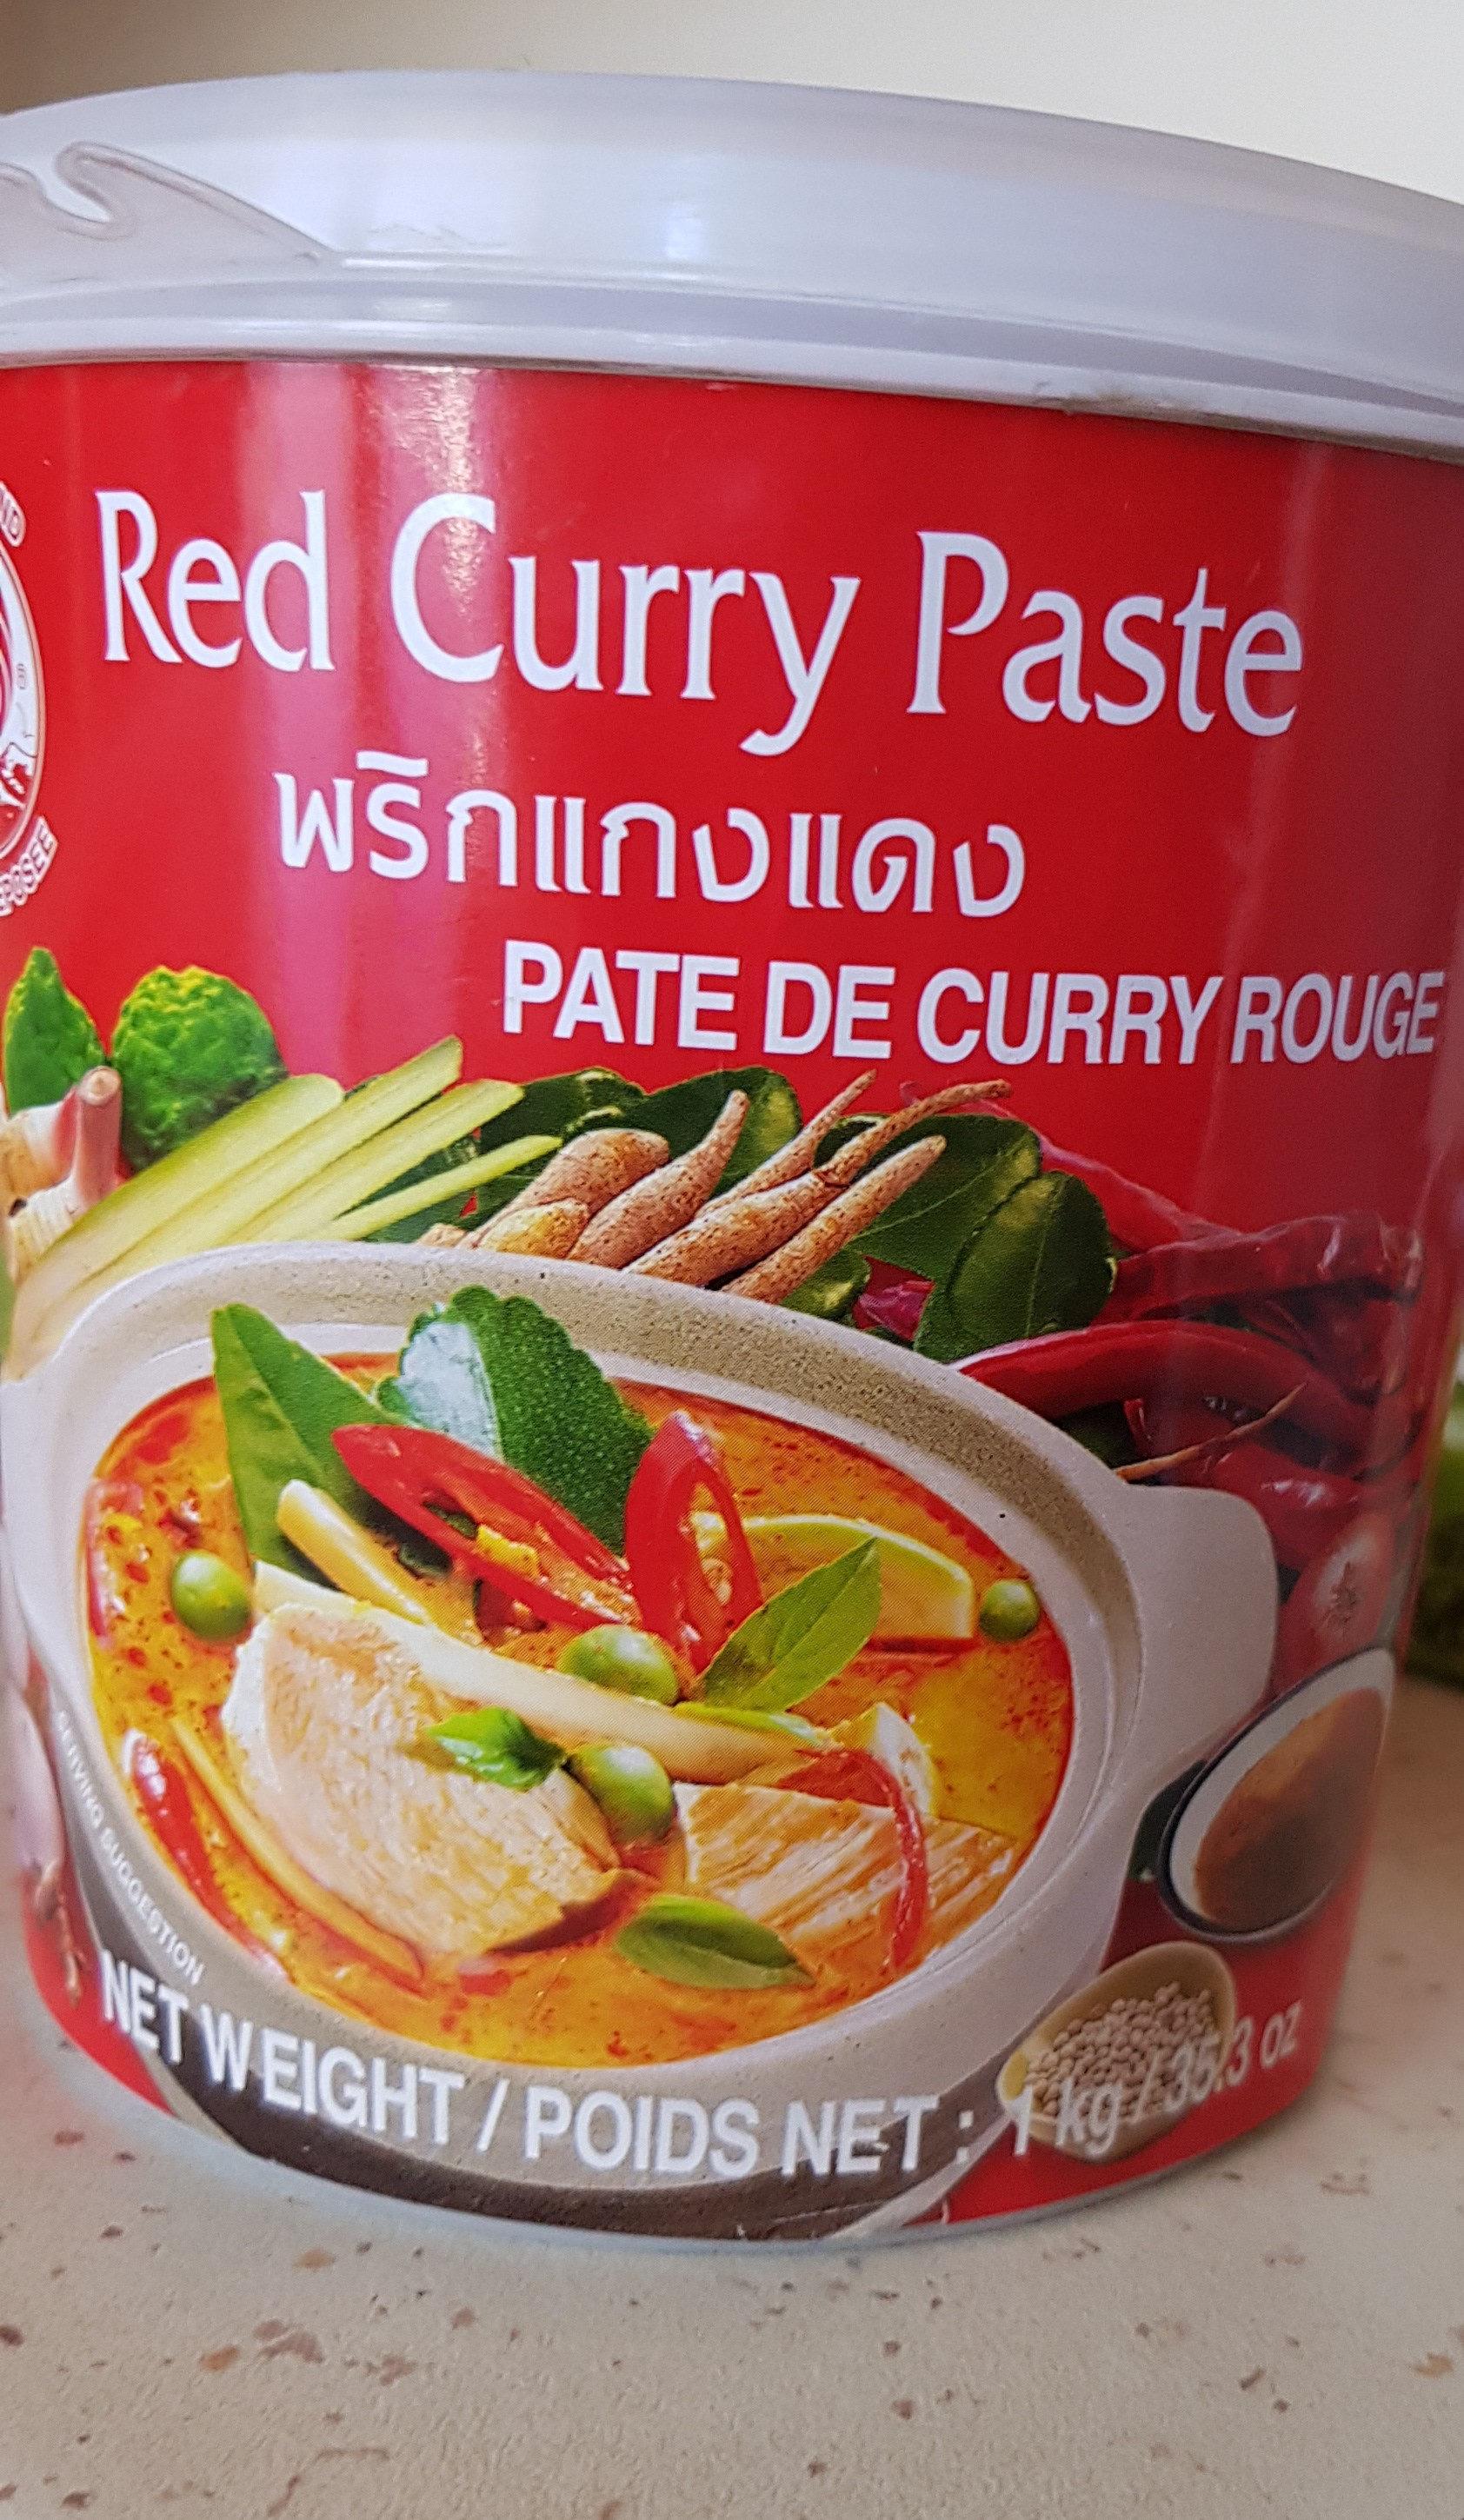 Red Curry Paste - Produit - fr